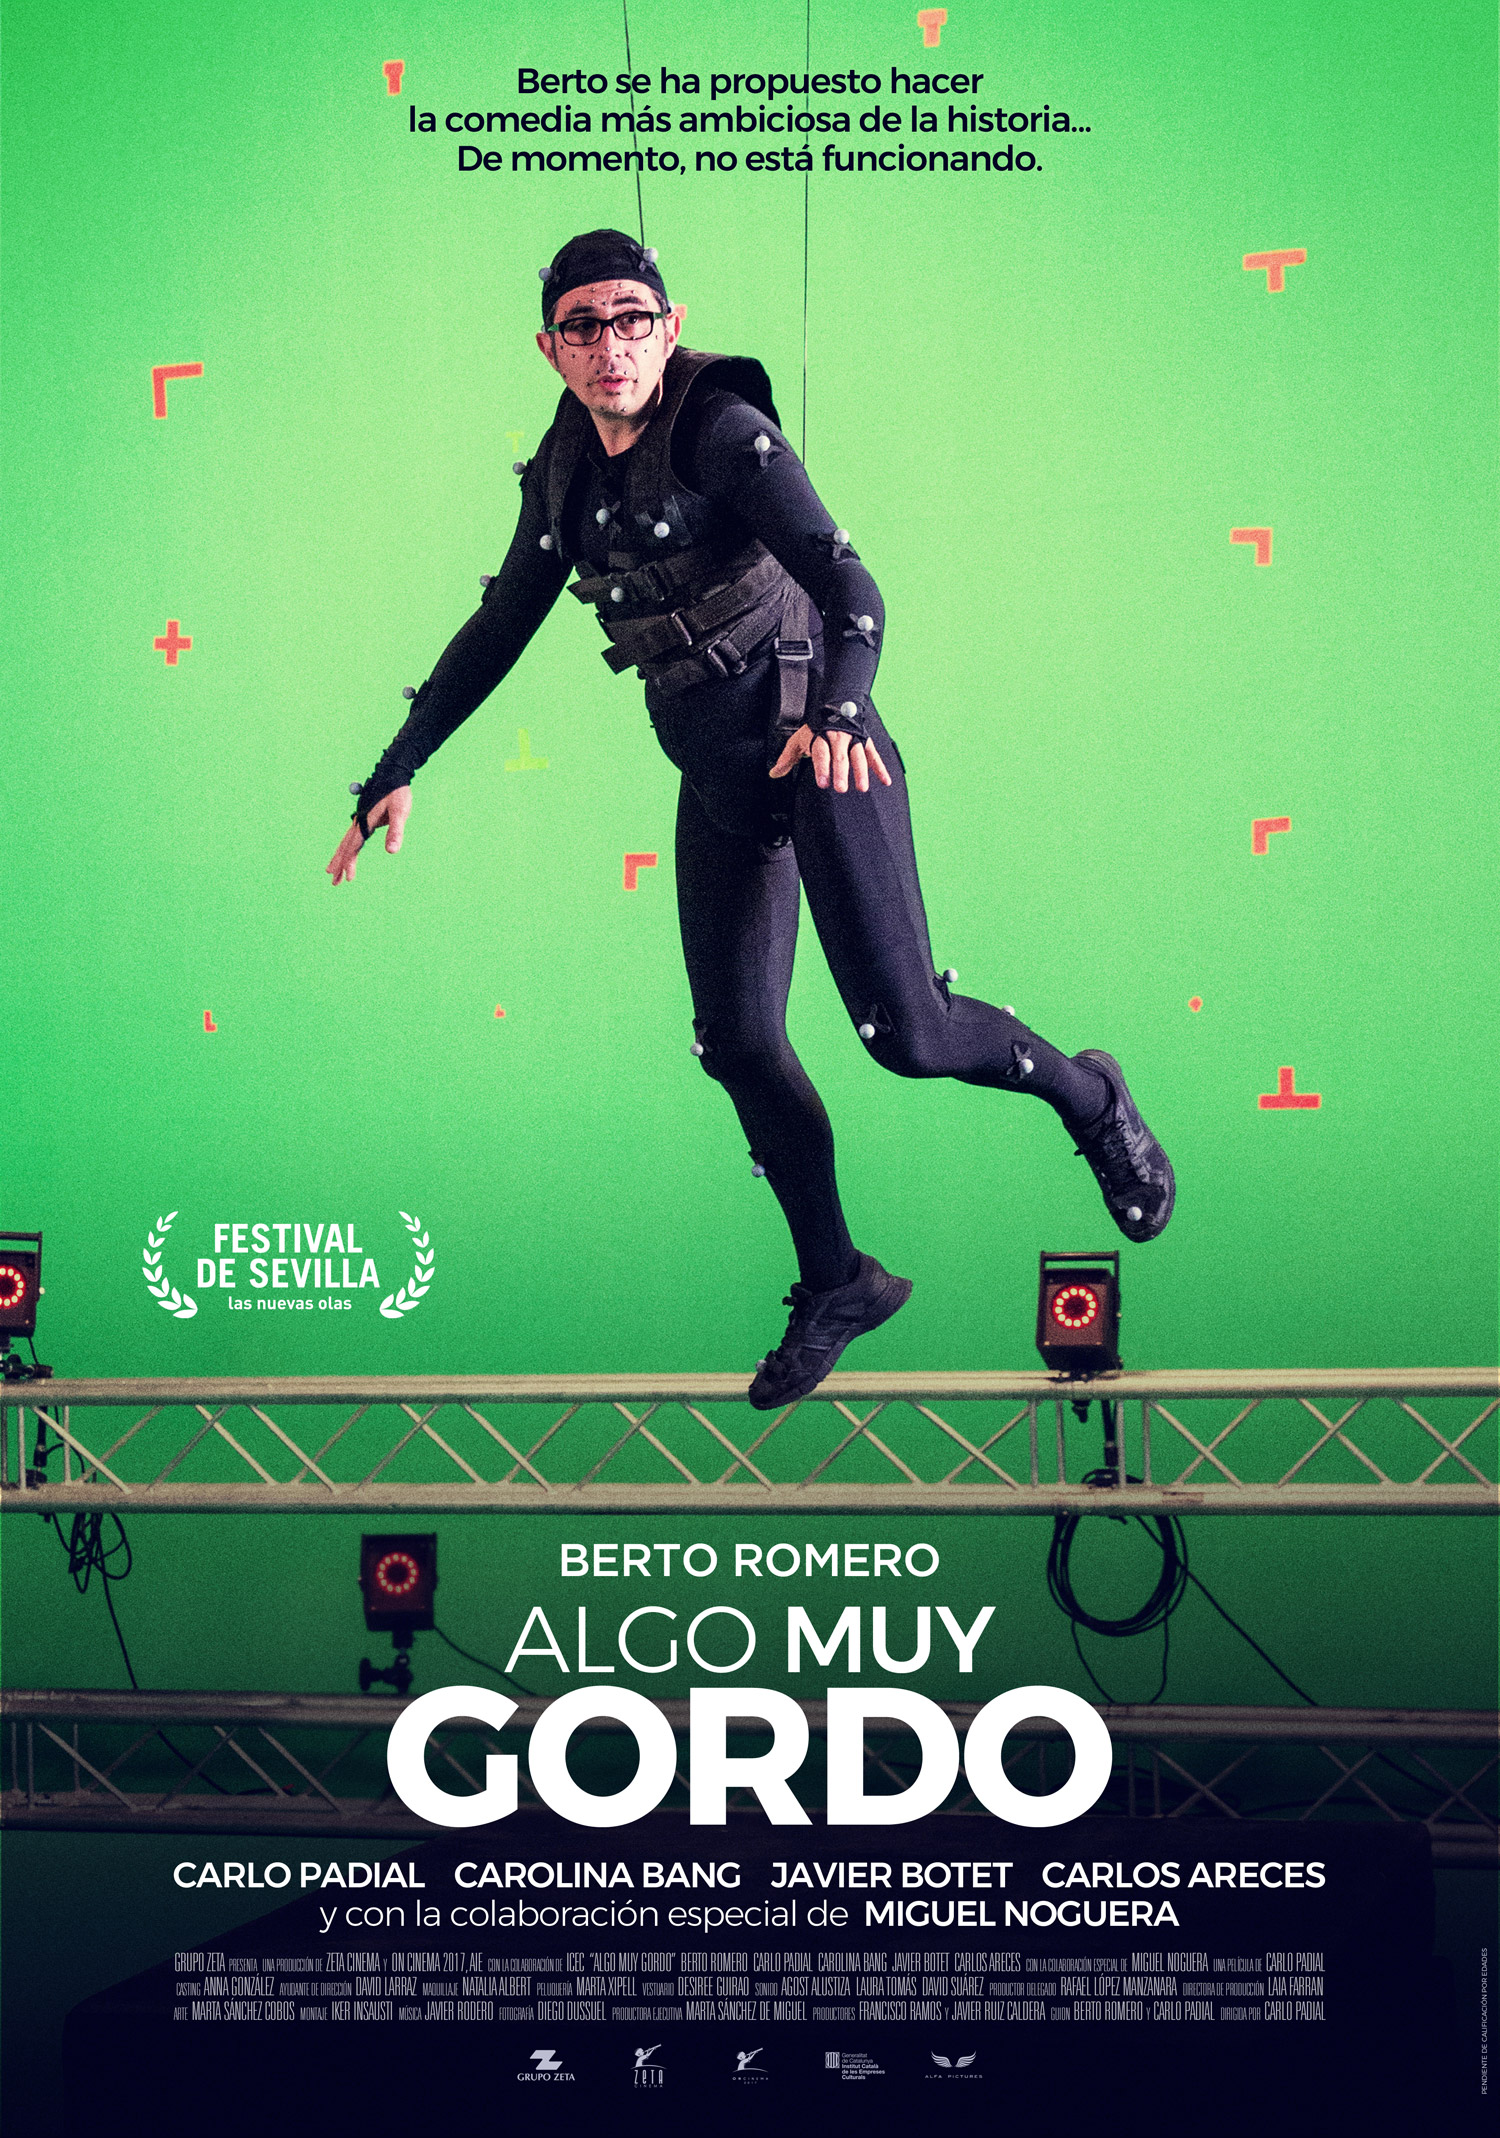 Algo Muy Gordo Javier Rodero Film Score.jpg